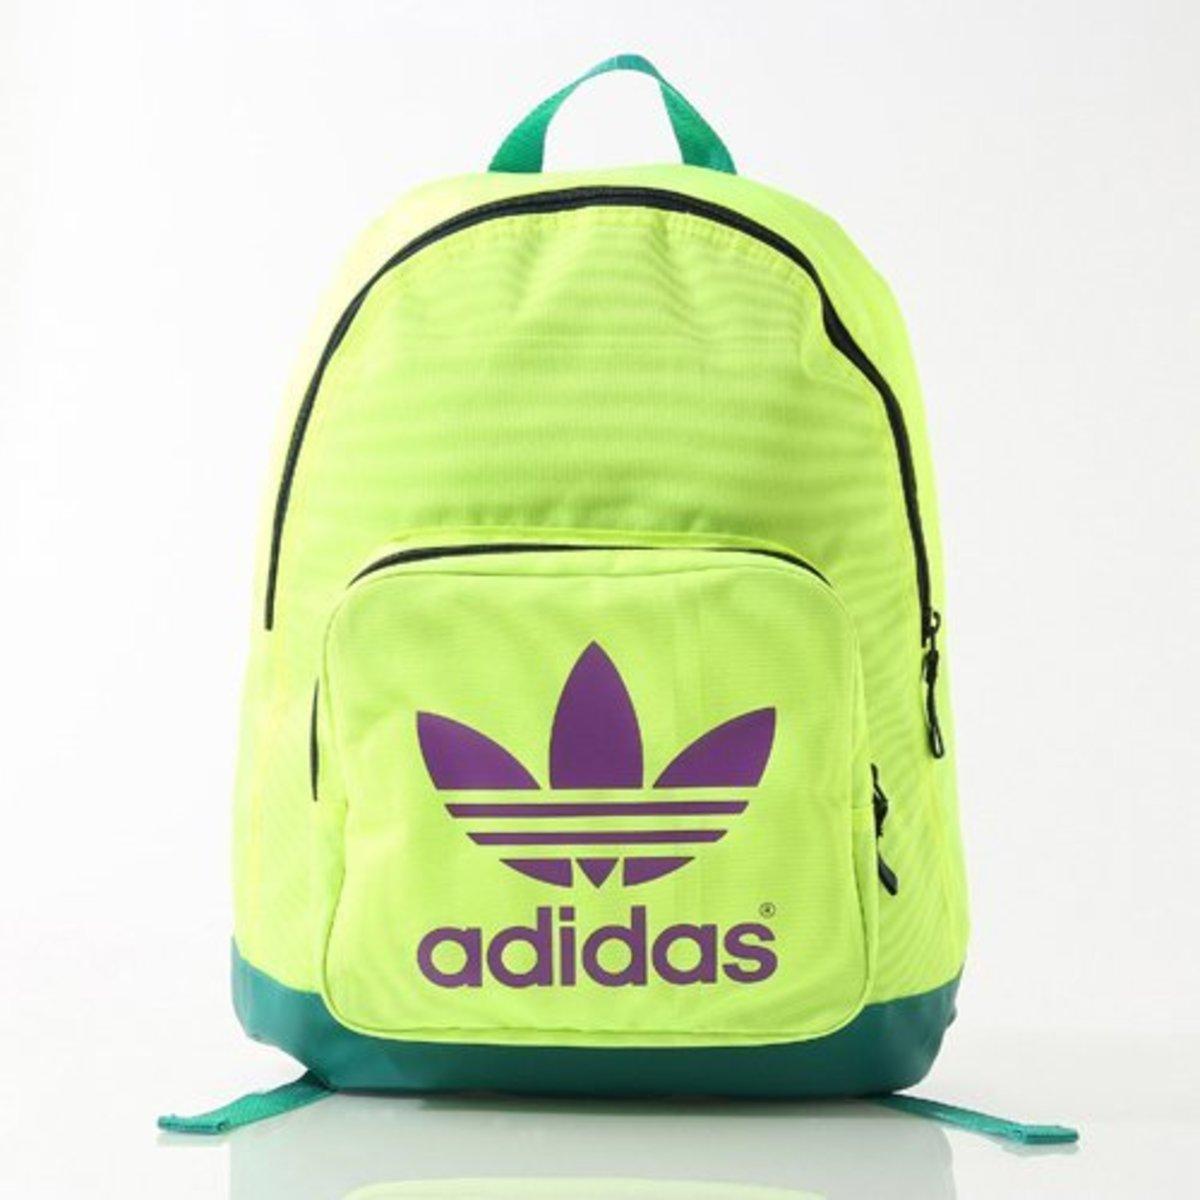 (Green Backpack) Japan❤️adidas Originals AC BPACK CLASS Backpack